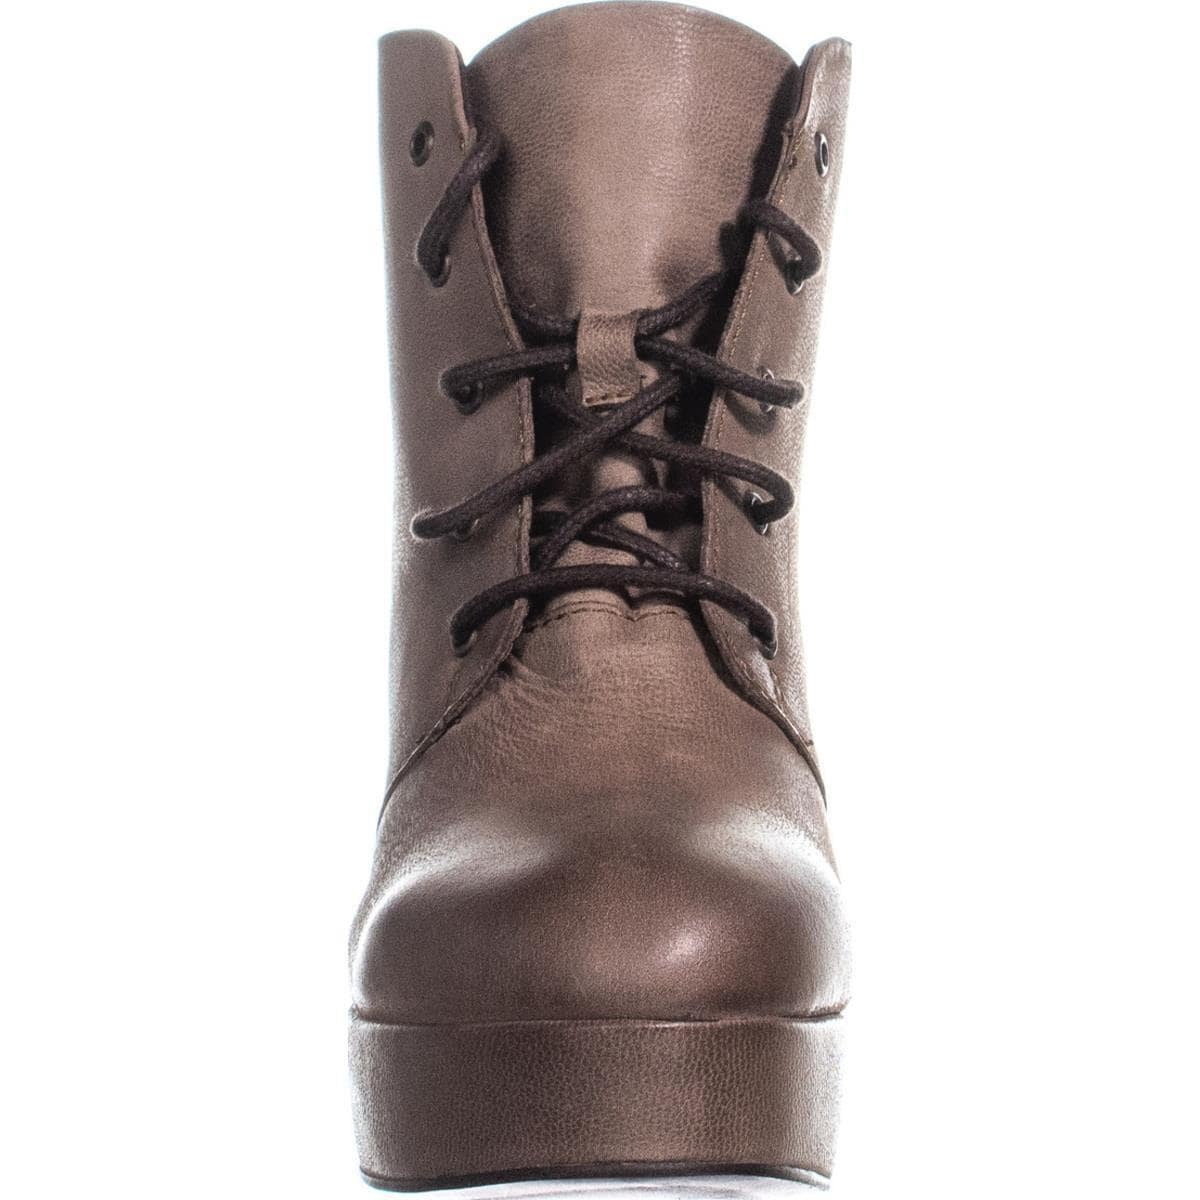 a0b59ab3537 Shop Steve Madden Raspy Lace-Up Platform Ankle Boots